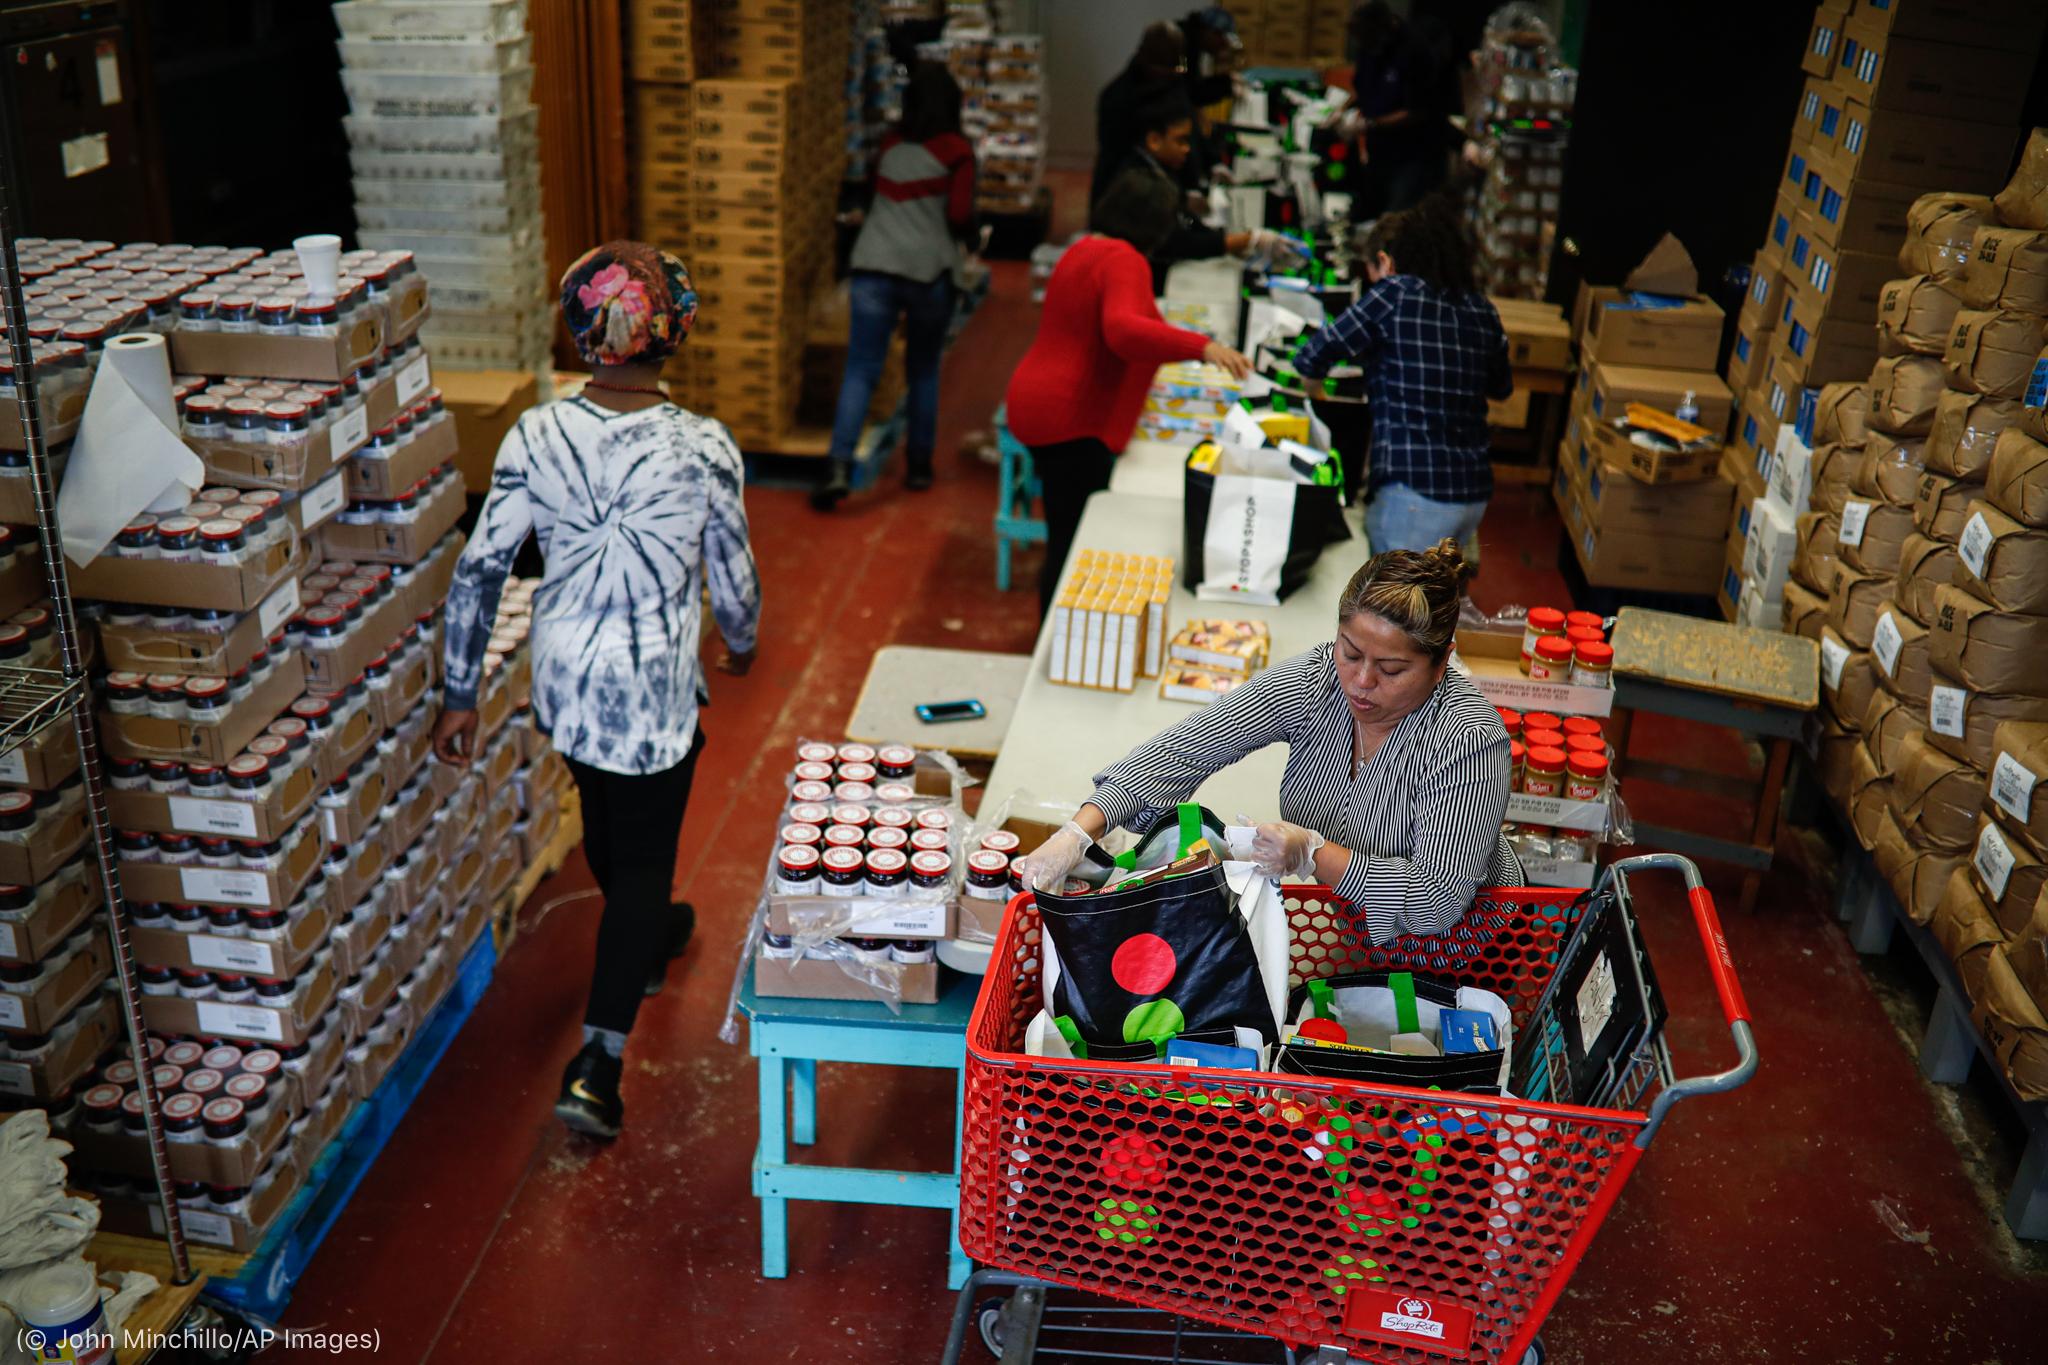 Sejumlah orang mengemas barang di samping tumpukan bahan makanan (© John Minchillo/AP Images)